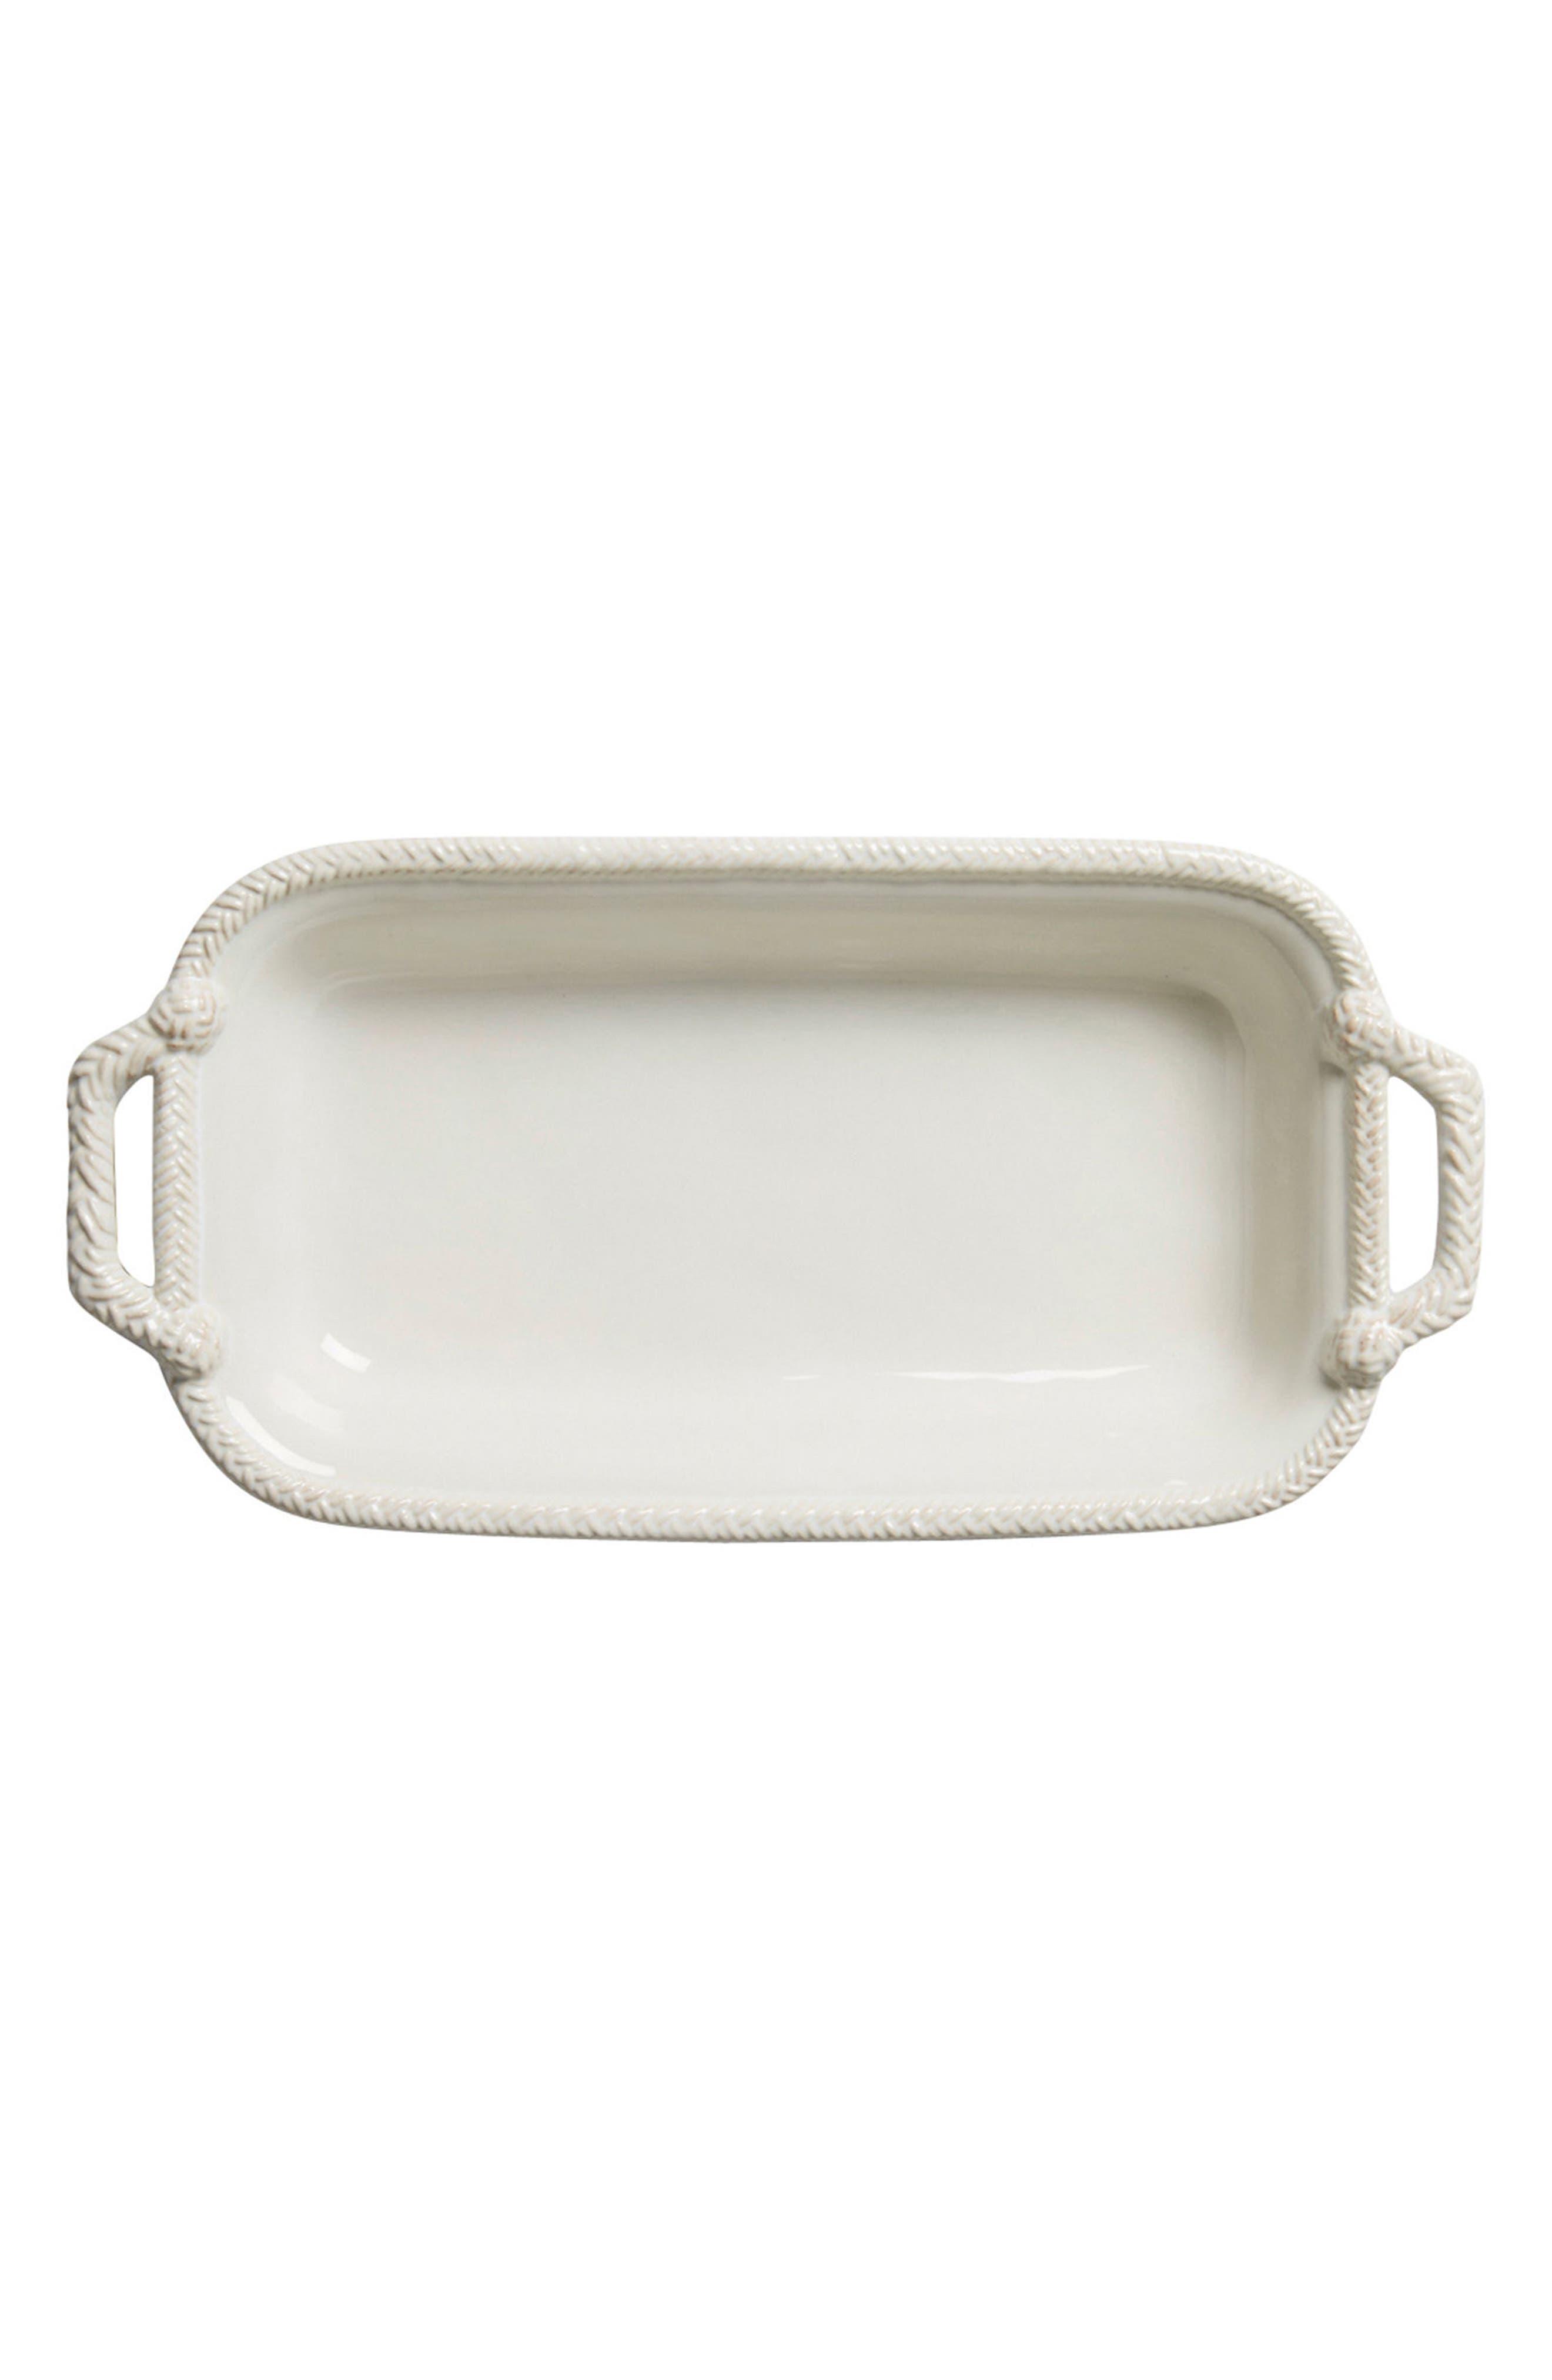 Main Image - Juliska Le Panier 1.5-Quart Rectangular Baking Dish